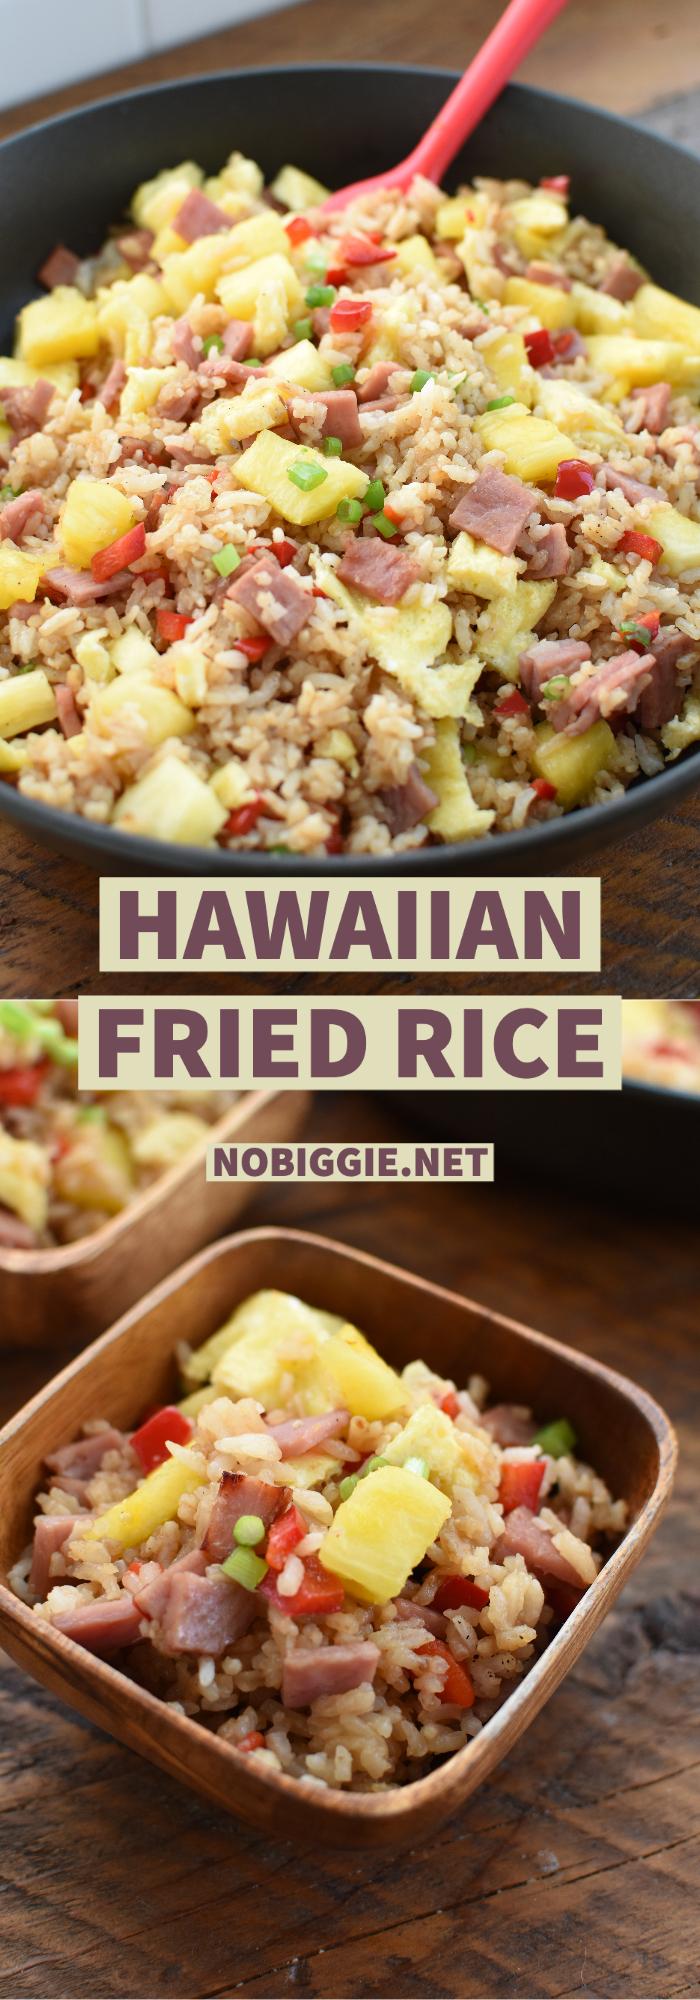 Hawaiian Fried Rice | NoBiggie.net